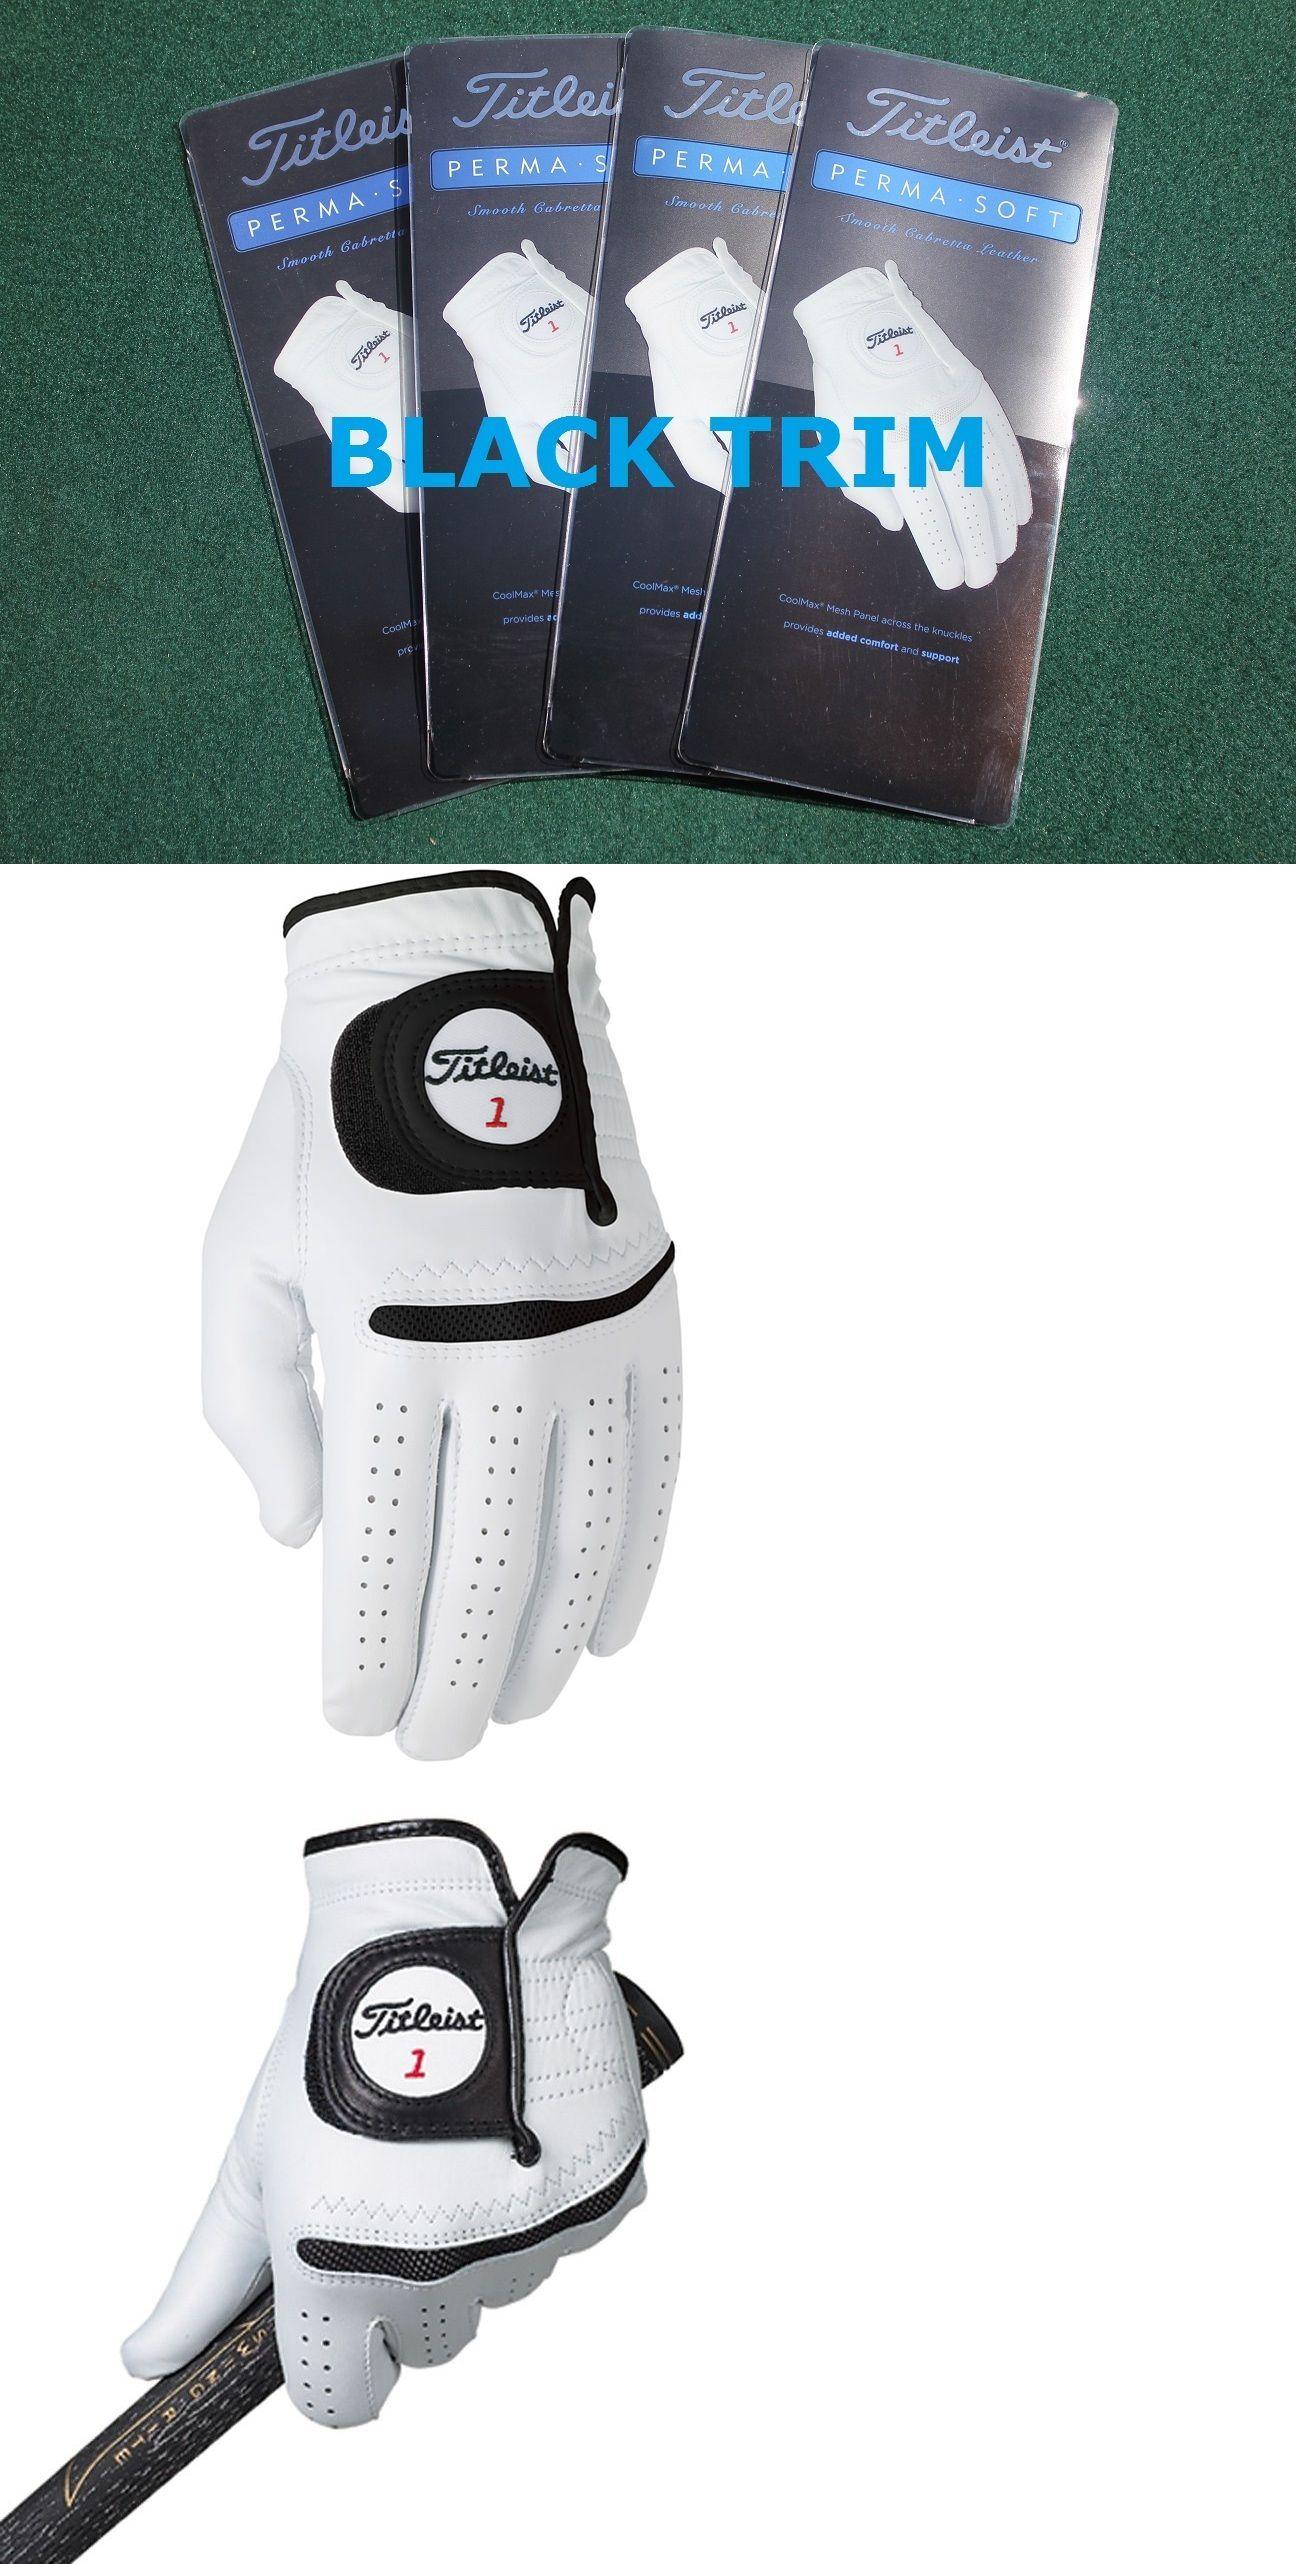 Mens gloves cadet - Golf Gloves 181135 4 New Titleist Perma Soft Golf Gloves Mens Cadet Large W